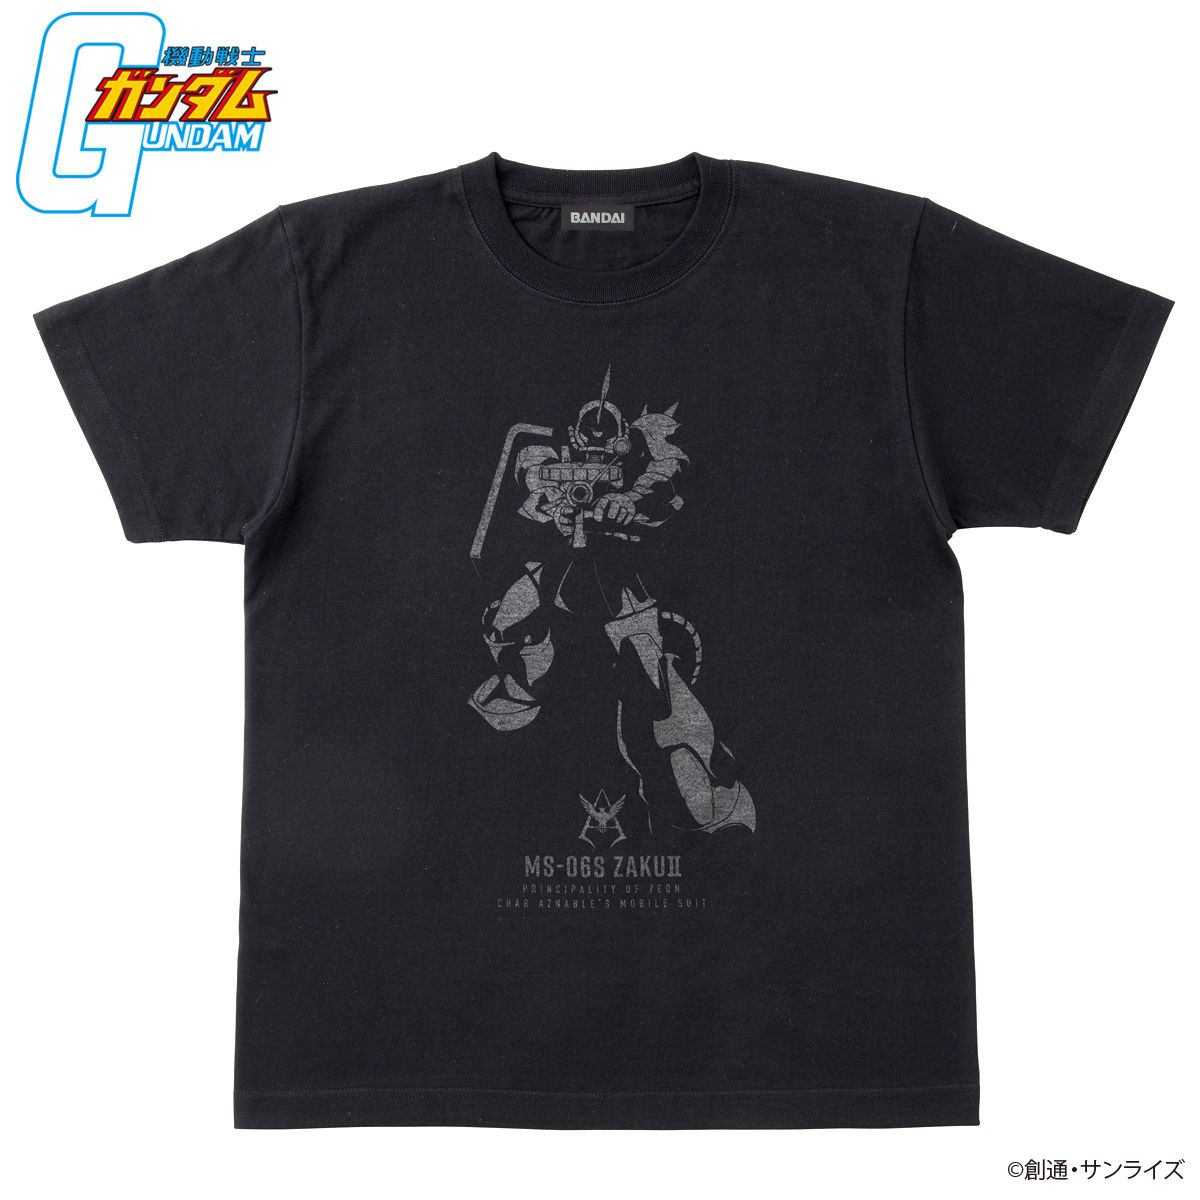 Mobile Suit Gundam BLACK Series T-shirt